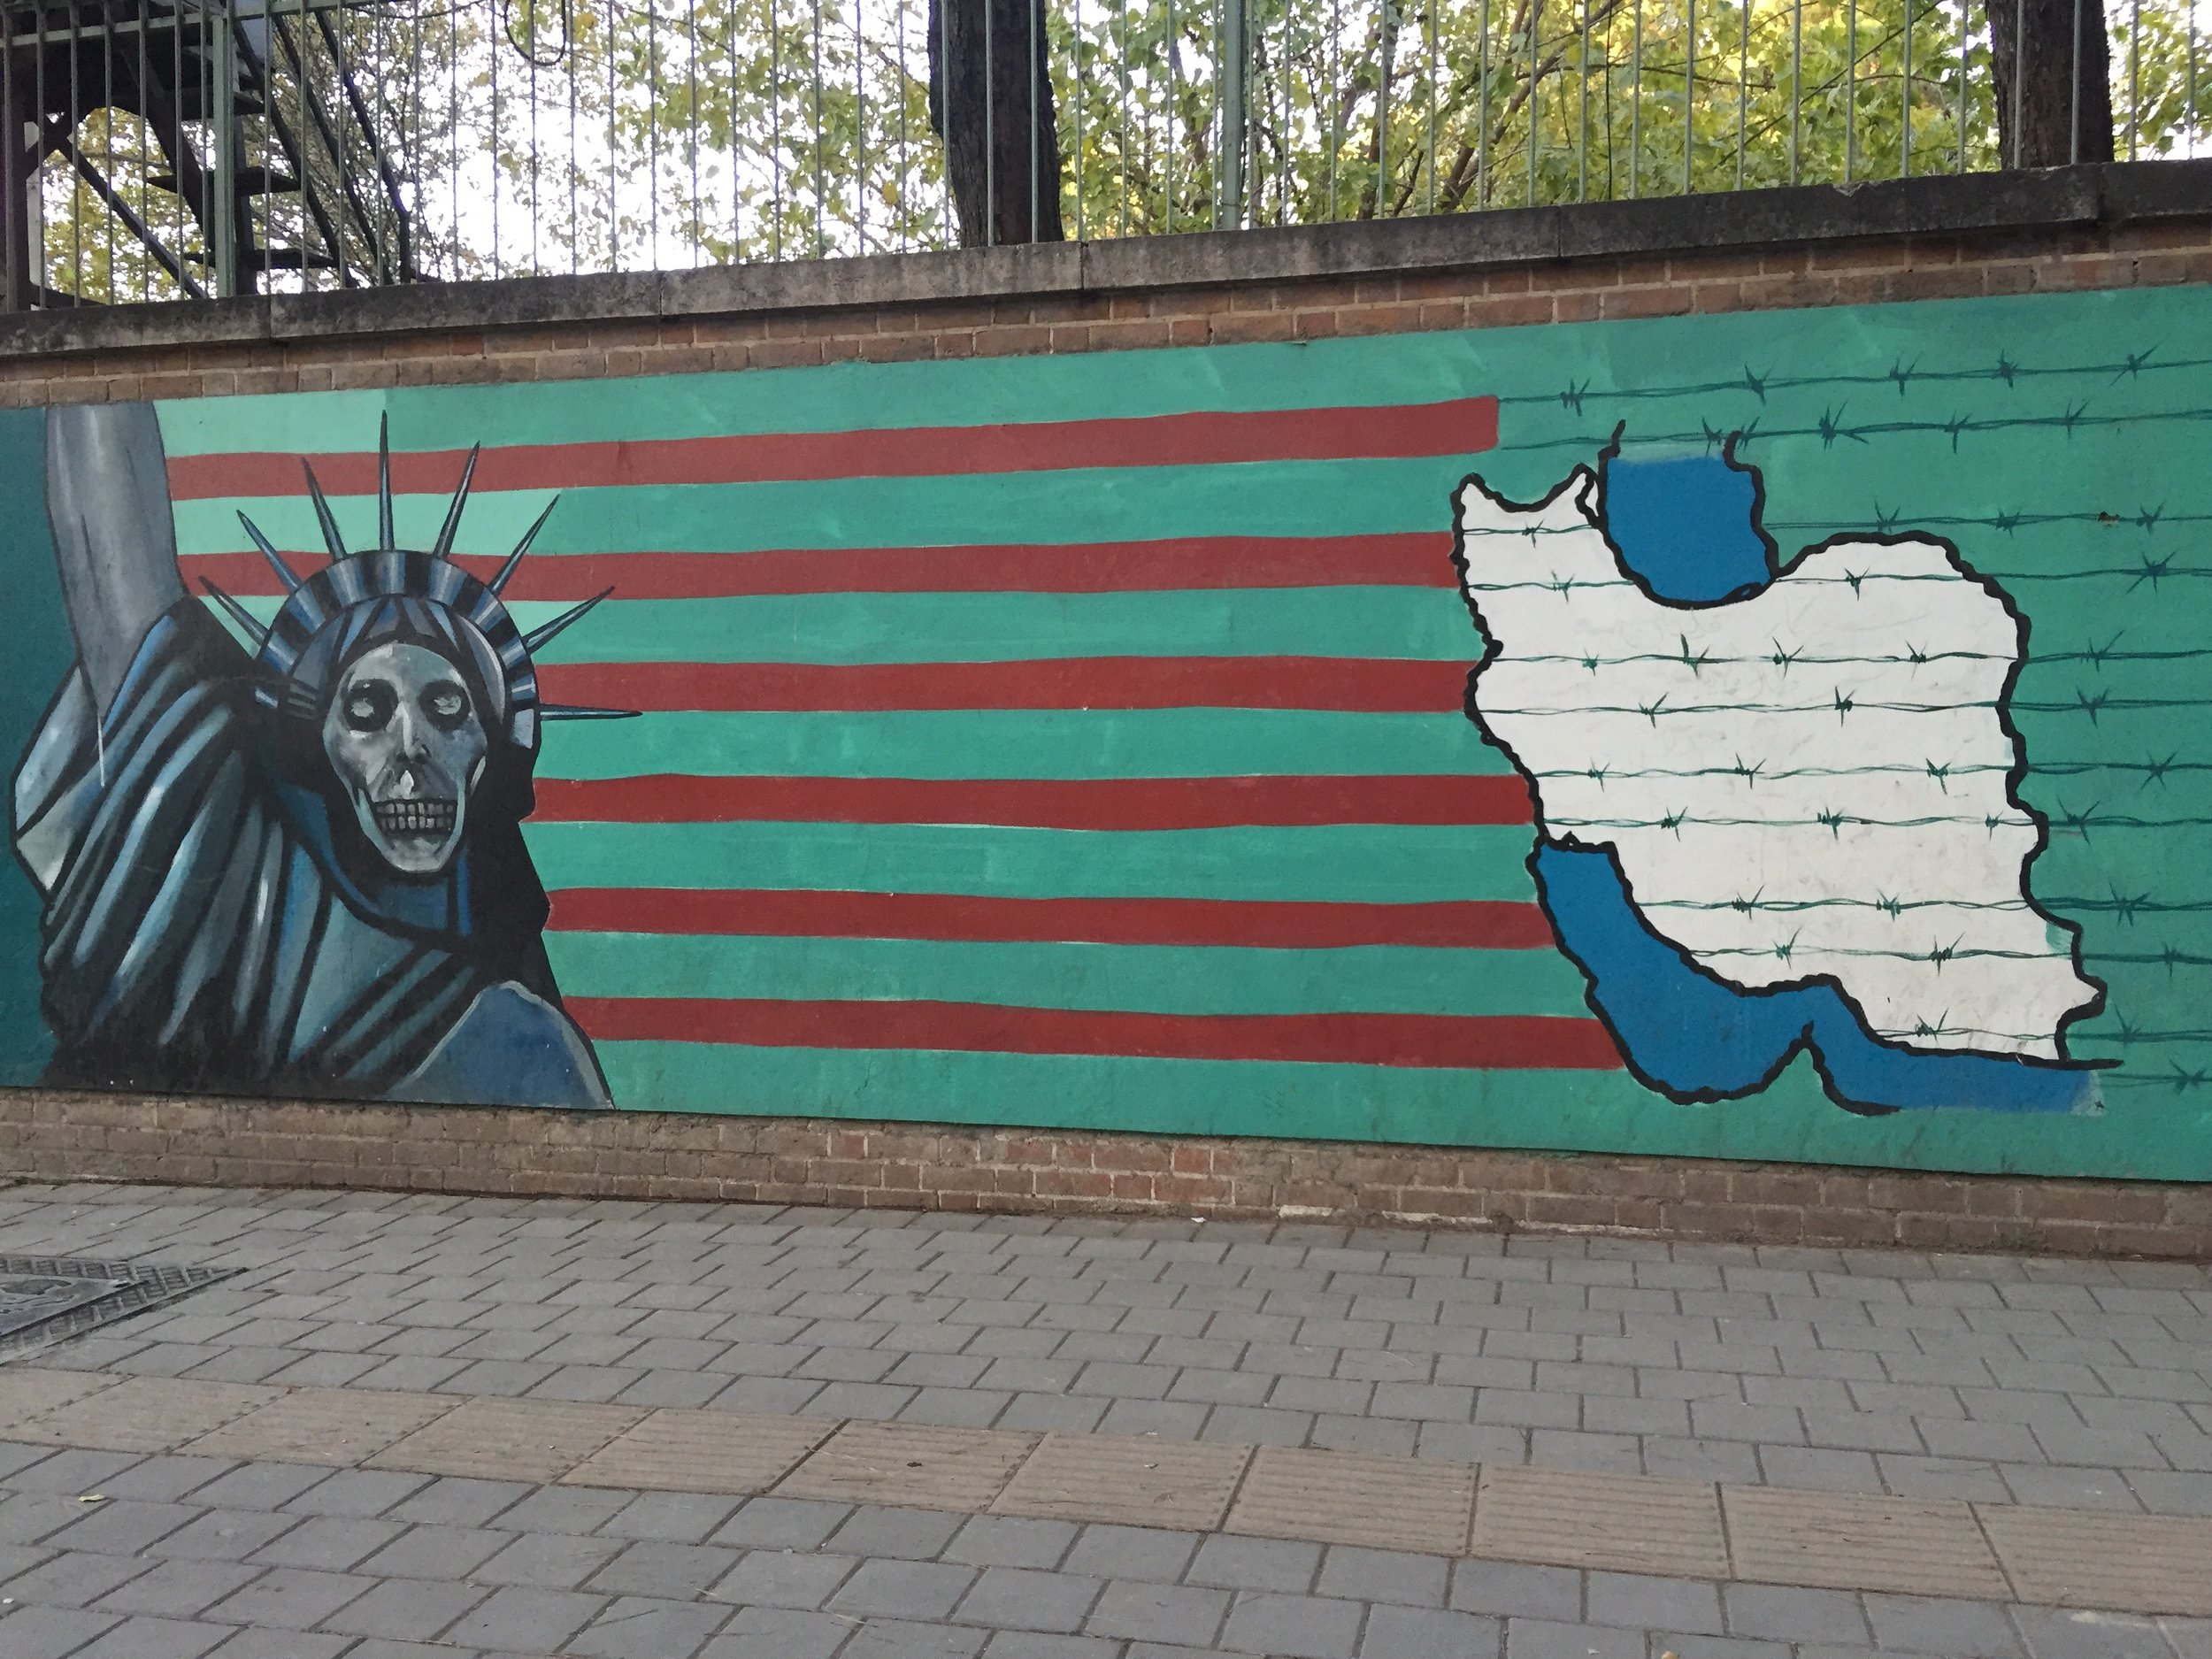 Iranian political propaganda